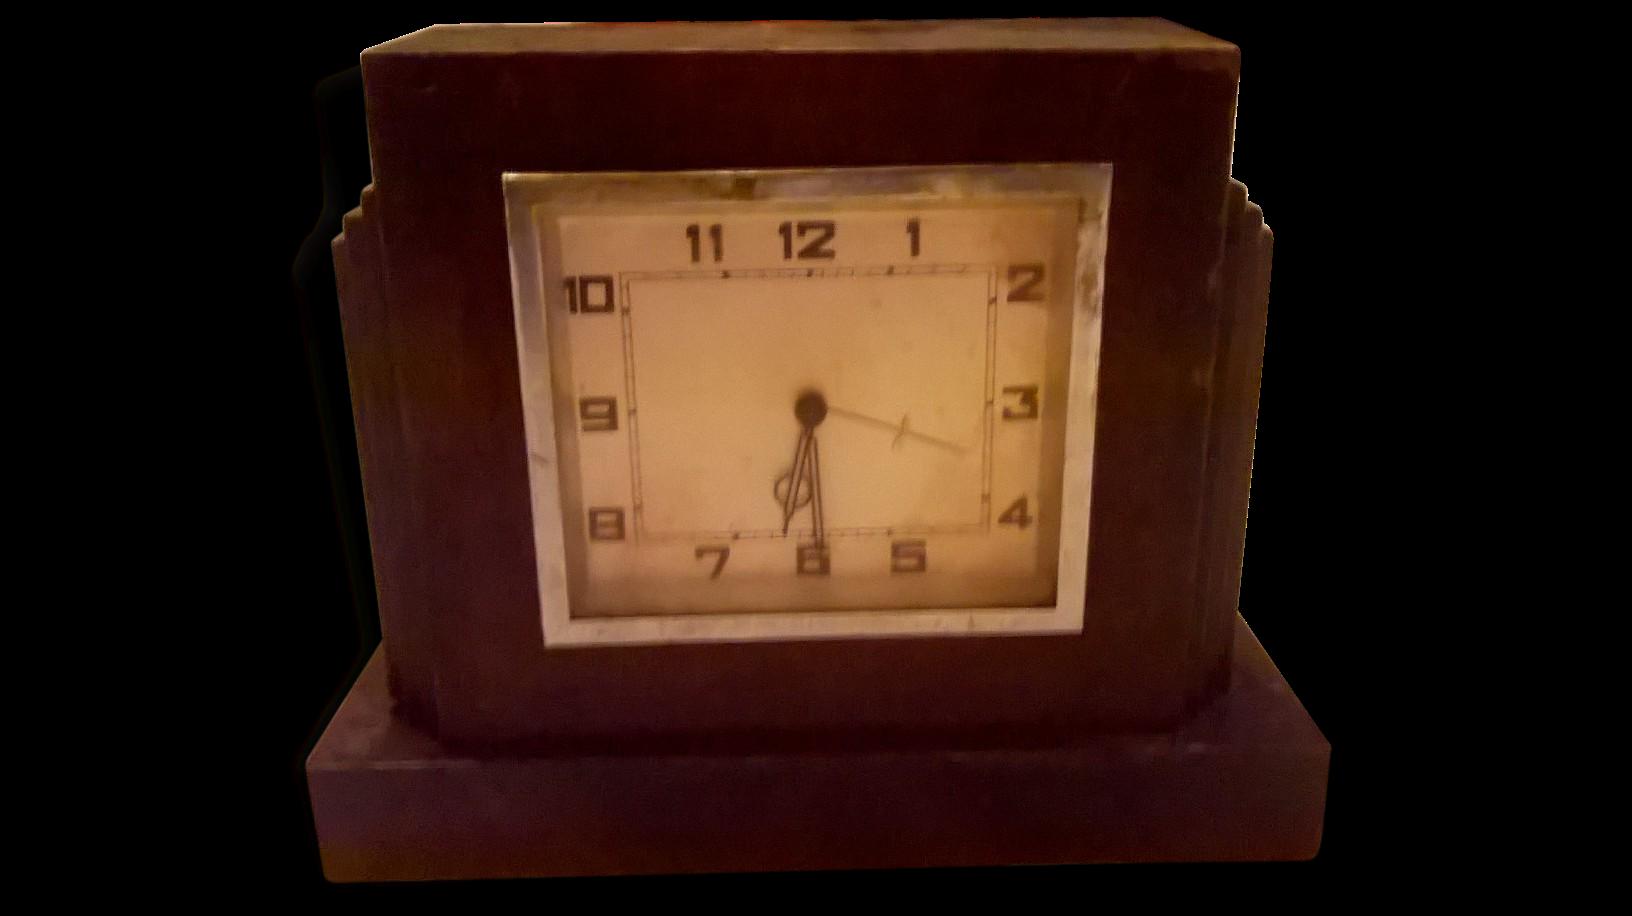 pendule originale design amazing horloge mr bricolage pendule mr bricolage mr bricolage horloge. Black Bedroom Furniture Sets. Home Design Ideas